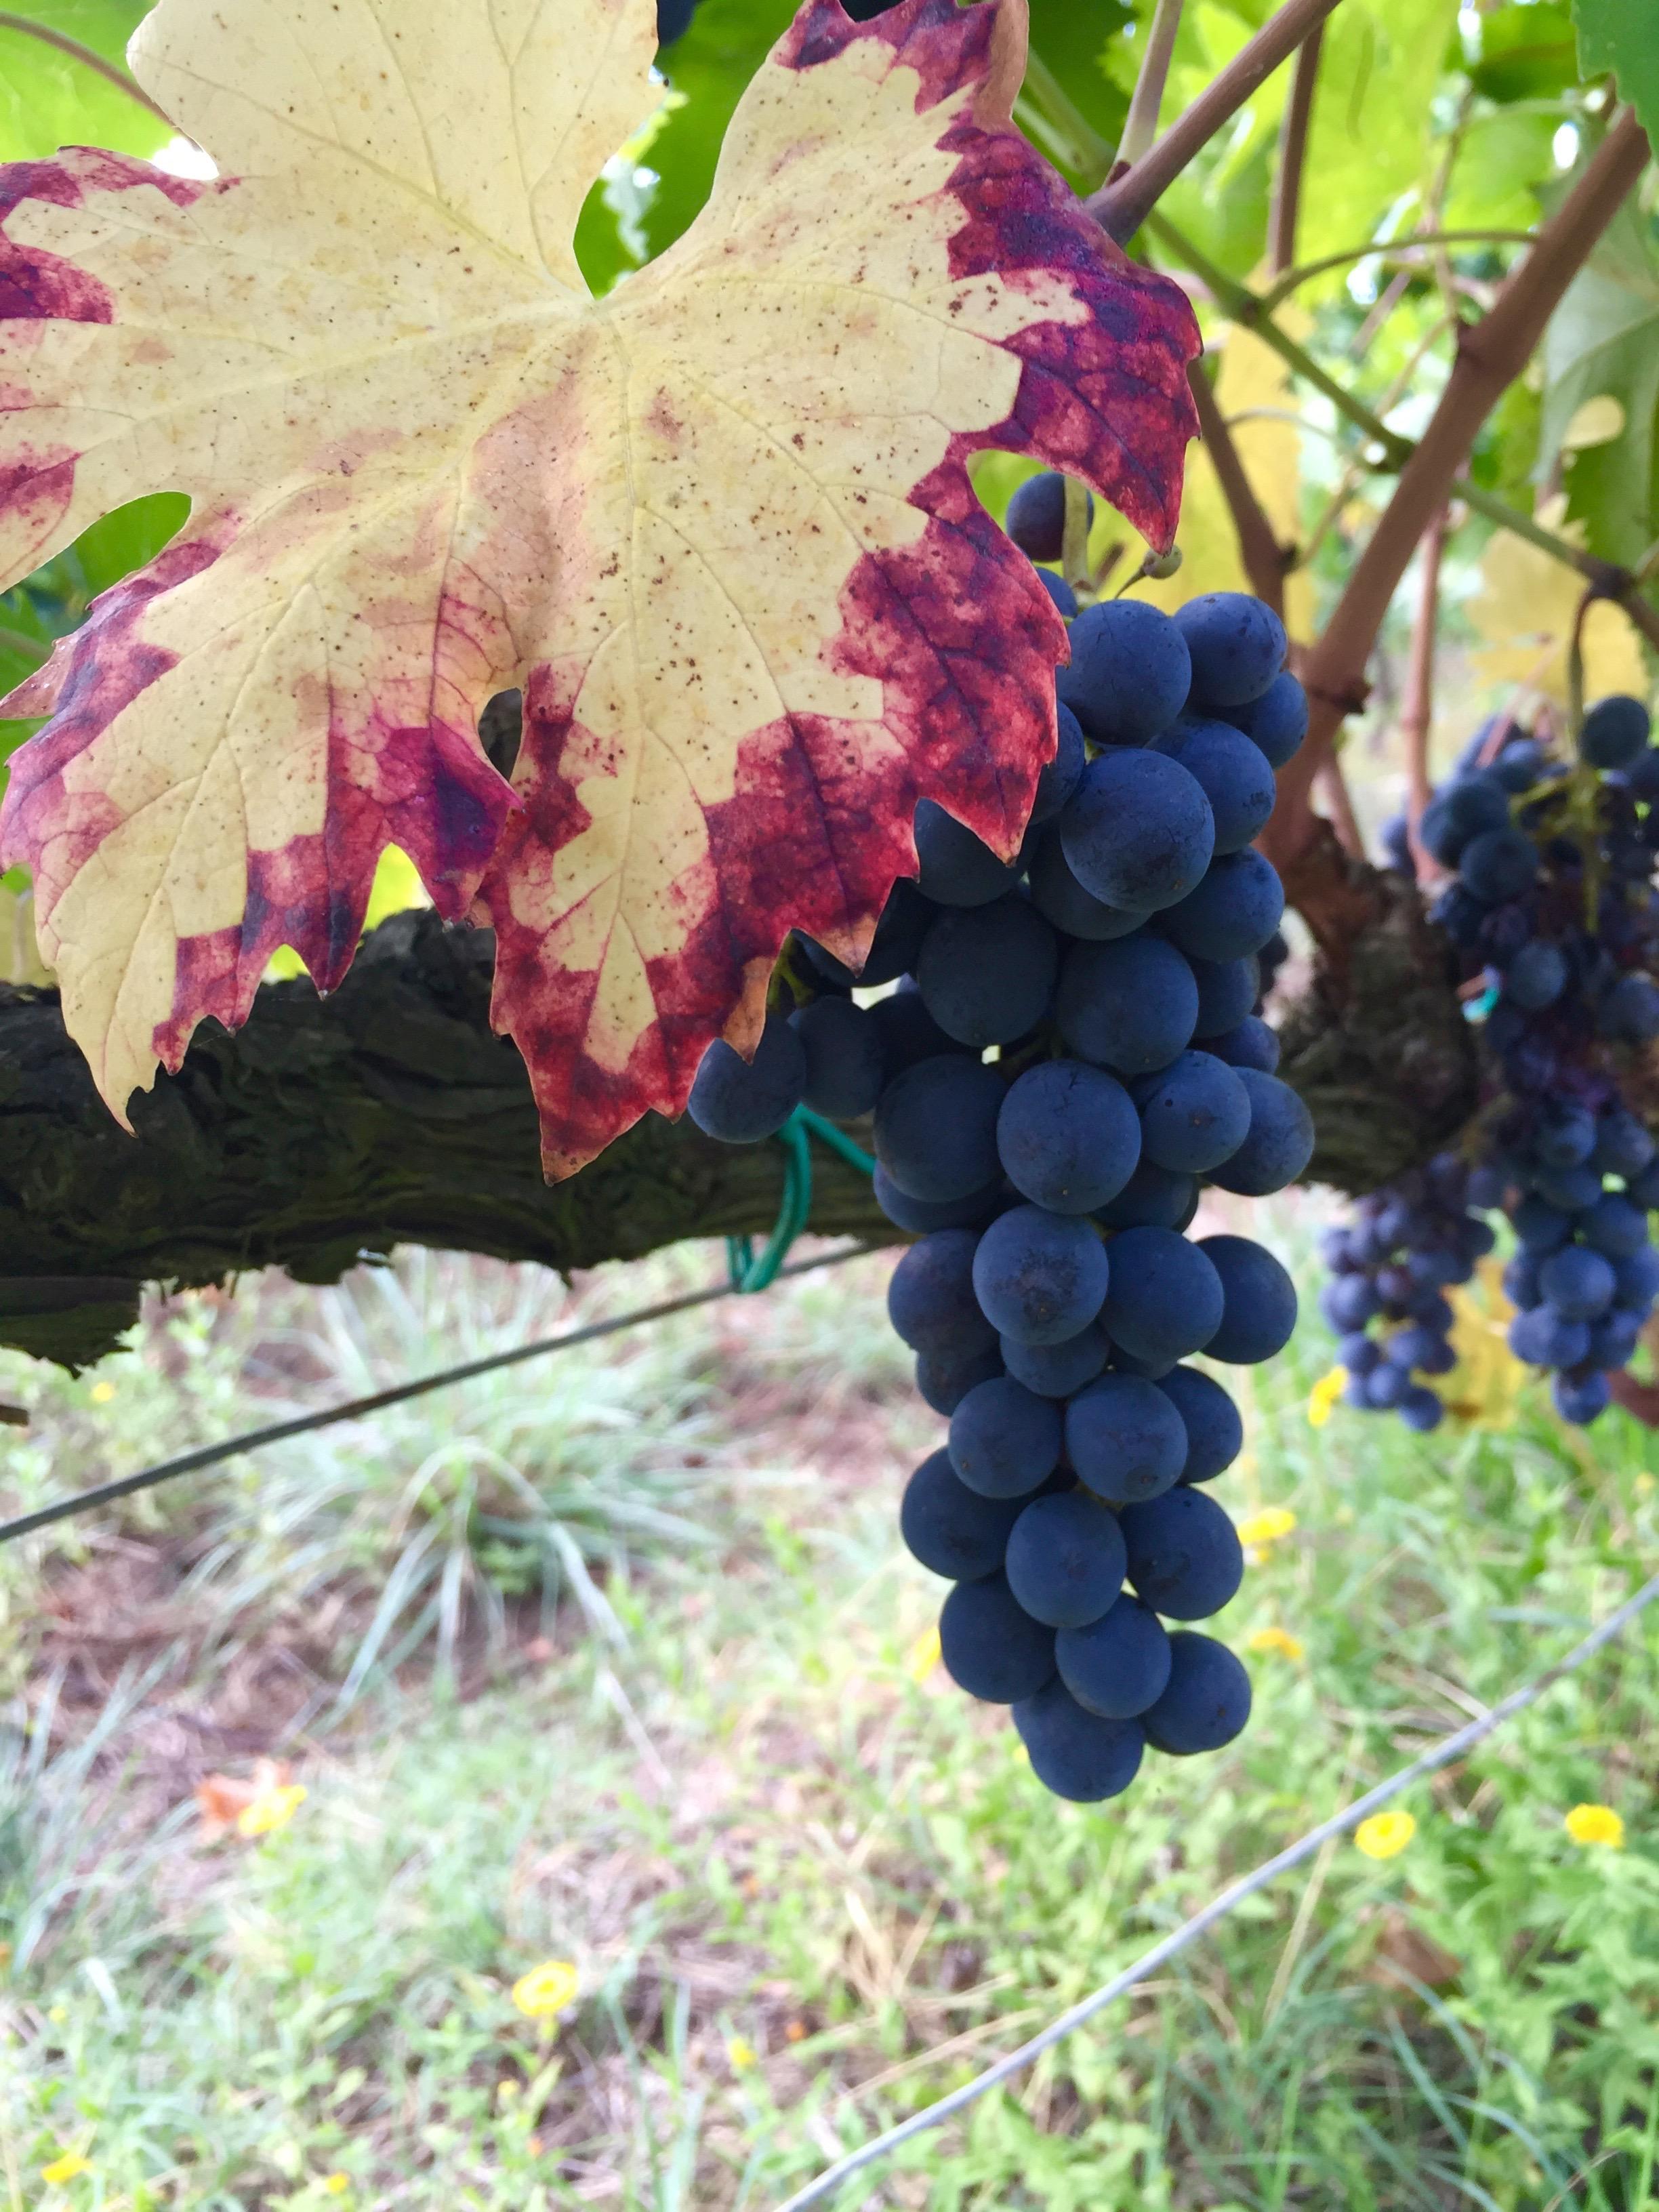 Grape harvest thesweetwanderlust.com